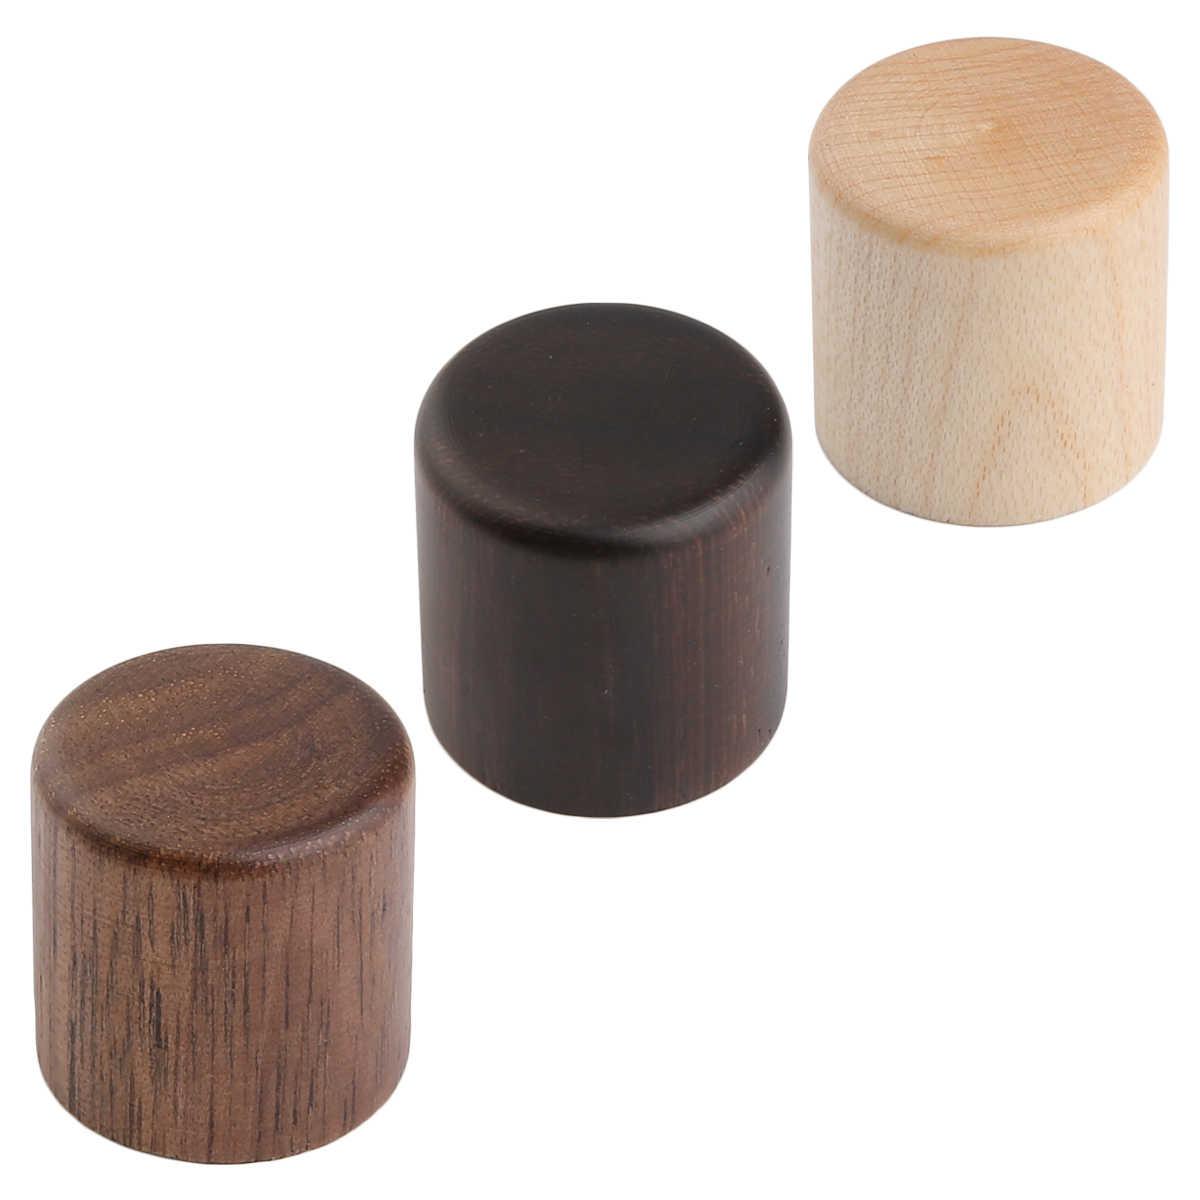 KAISH 2-Pack Wood Knobs Tele Style Flat Top Dome Knobs Guitar Bass Wood Knob Barrel Knobs Maple/Rose/Walnut Wood